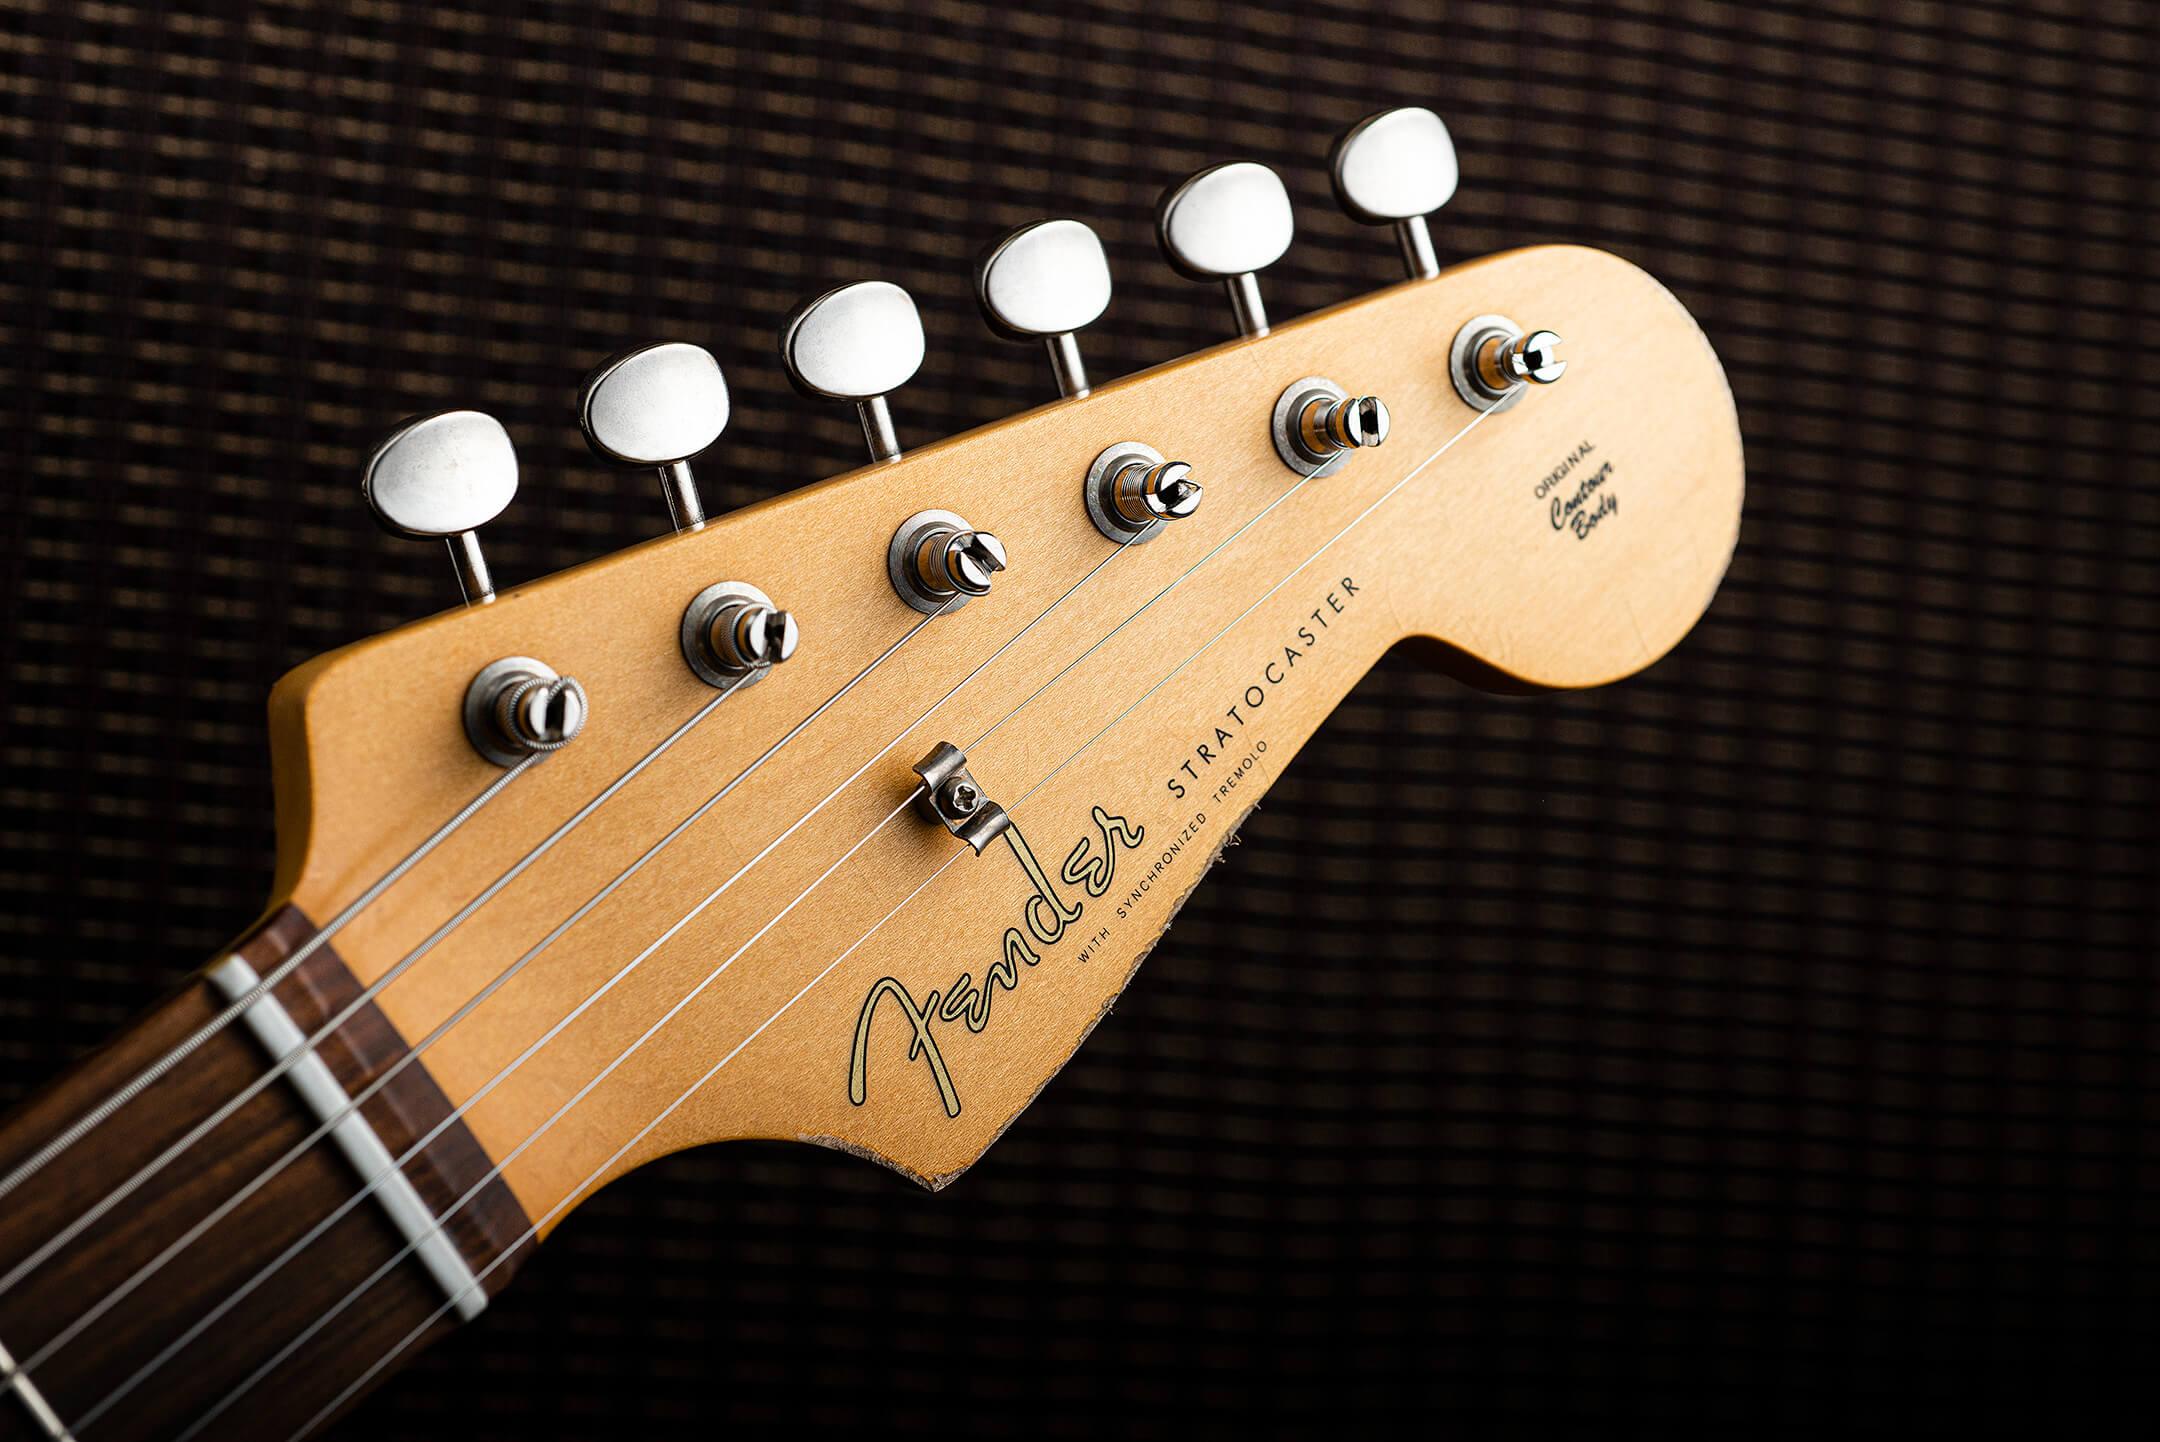 Fender Vintera Road Worn 60s Stratocaster Headstock